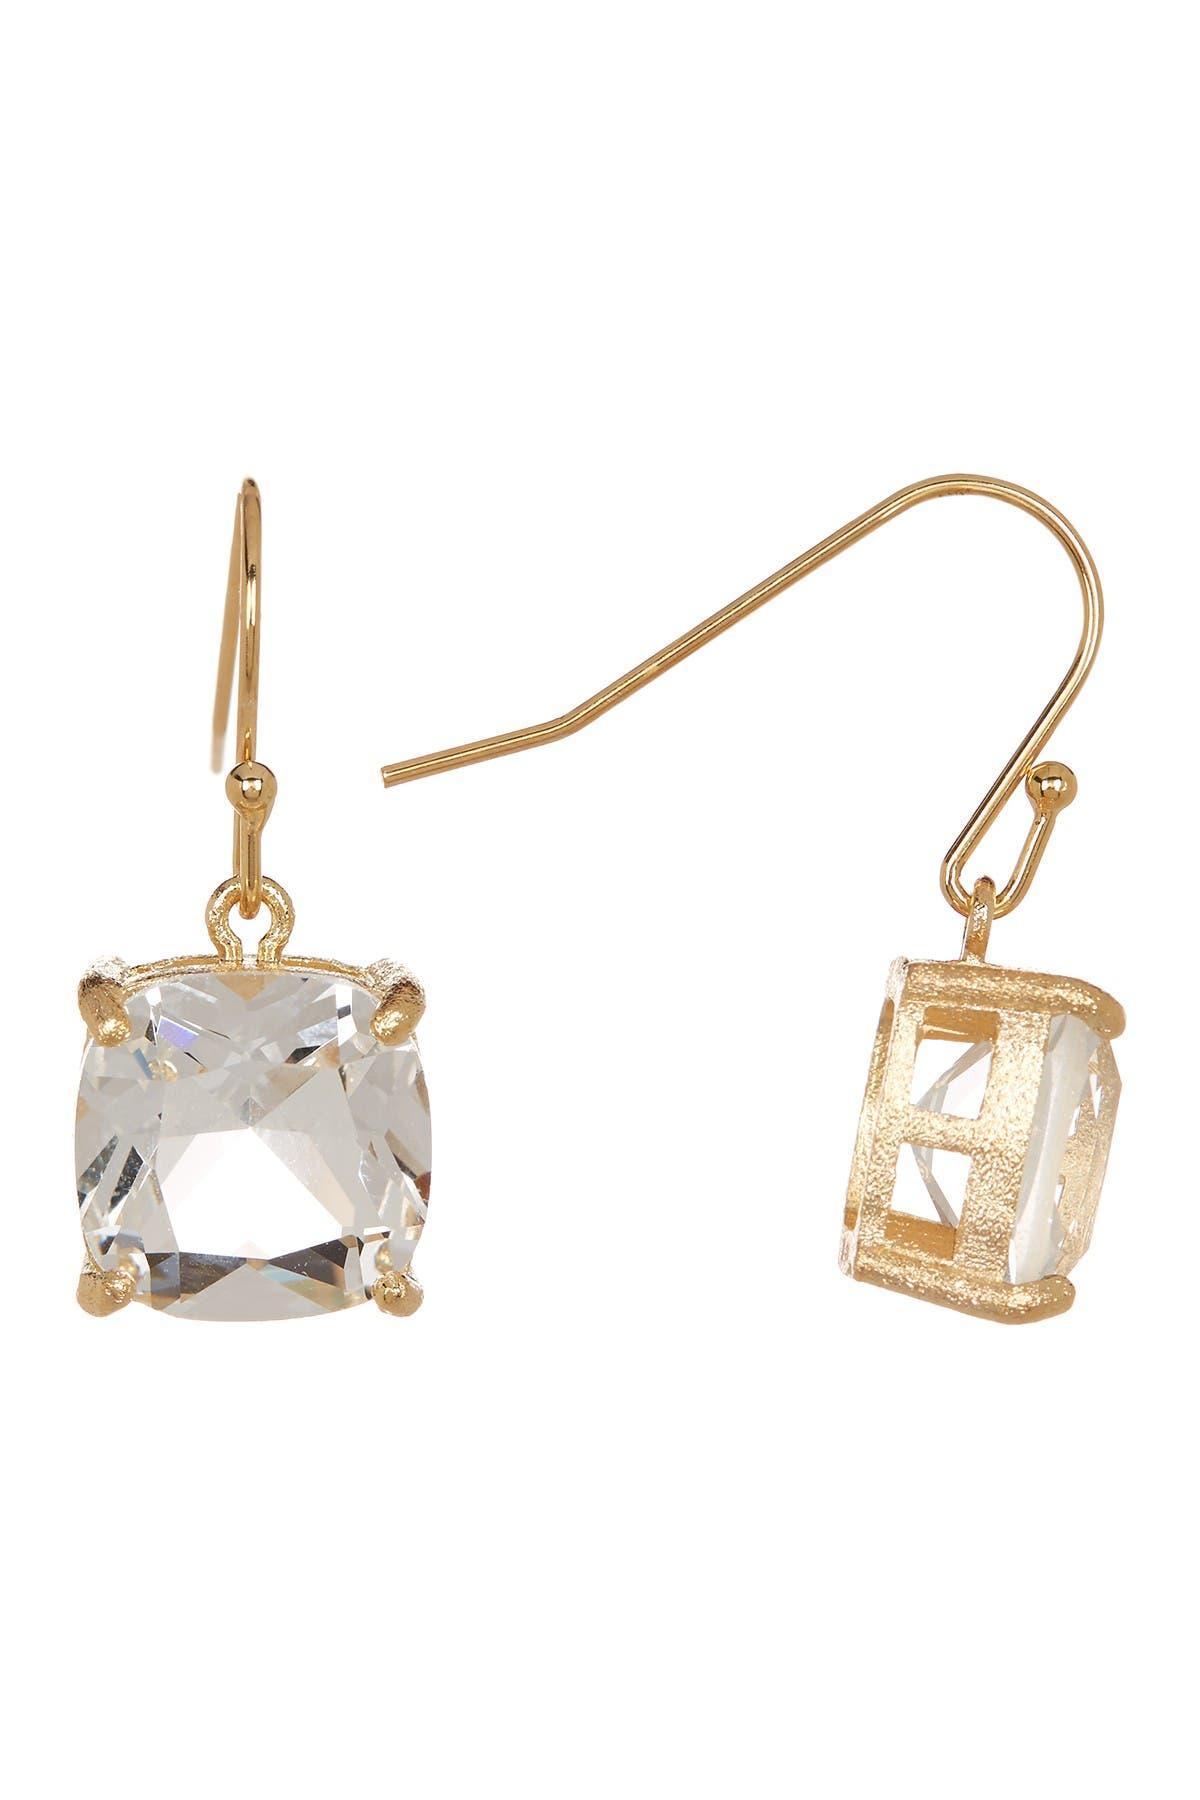 Image of Rivka Friedman Rock Crystal Drop Earrings